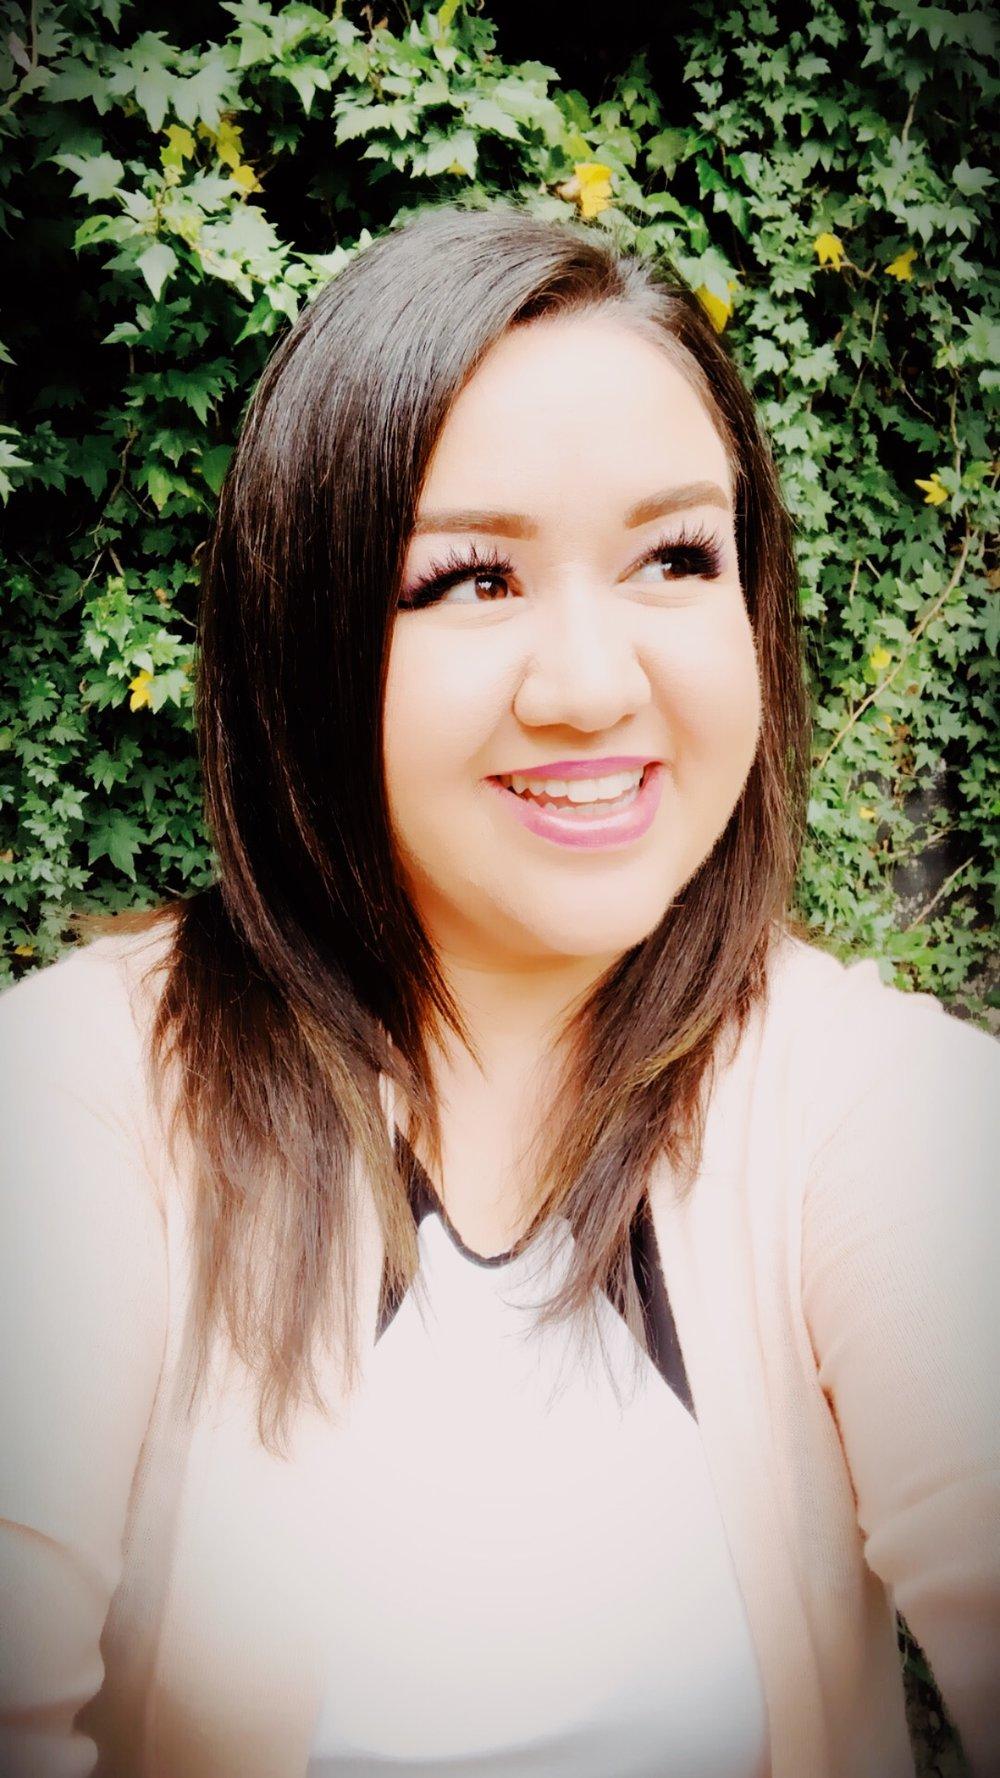 Edith Duarte is the Editor of    Ella Inspires    and Creative Director of    EllaDesign.Studio    (coming soon)